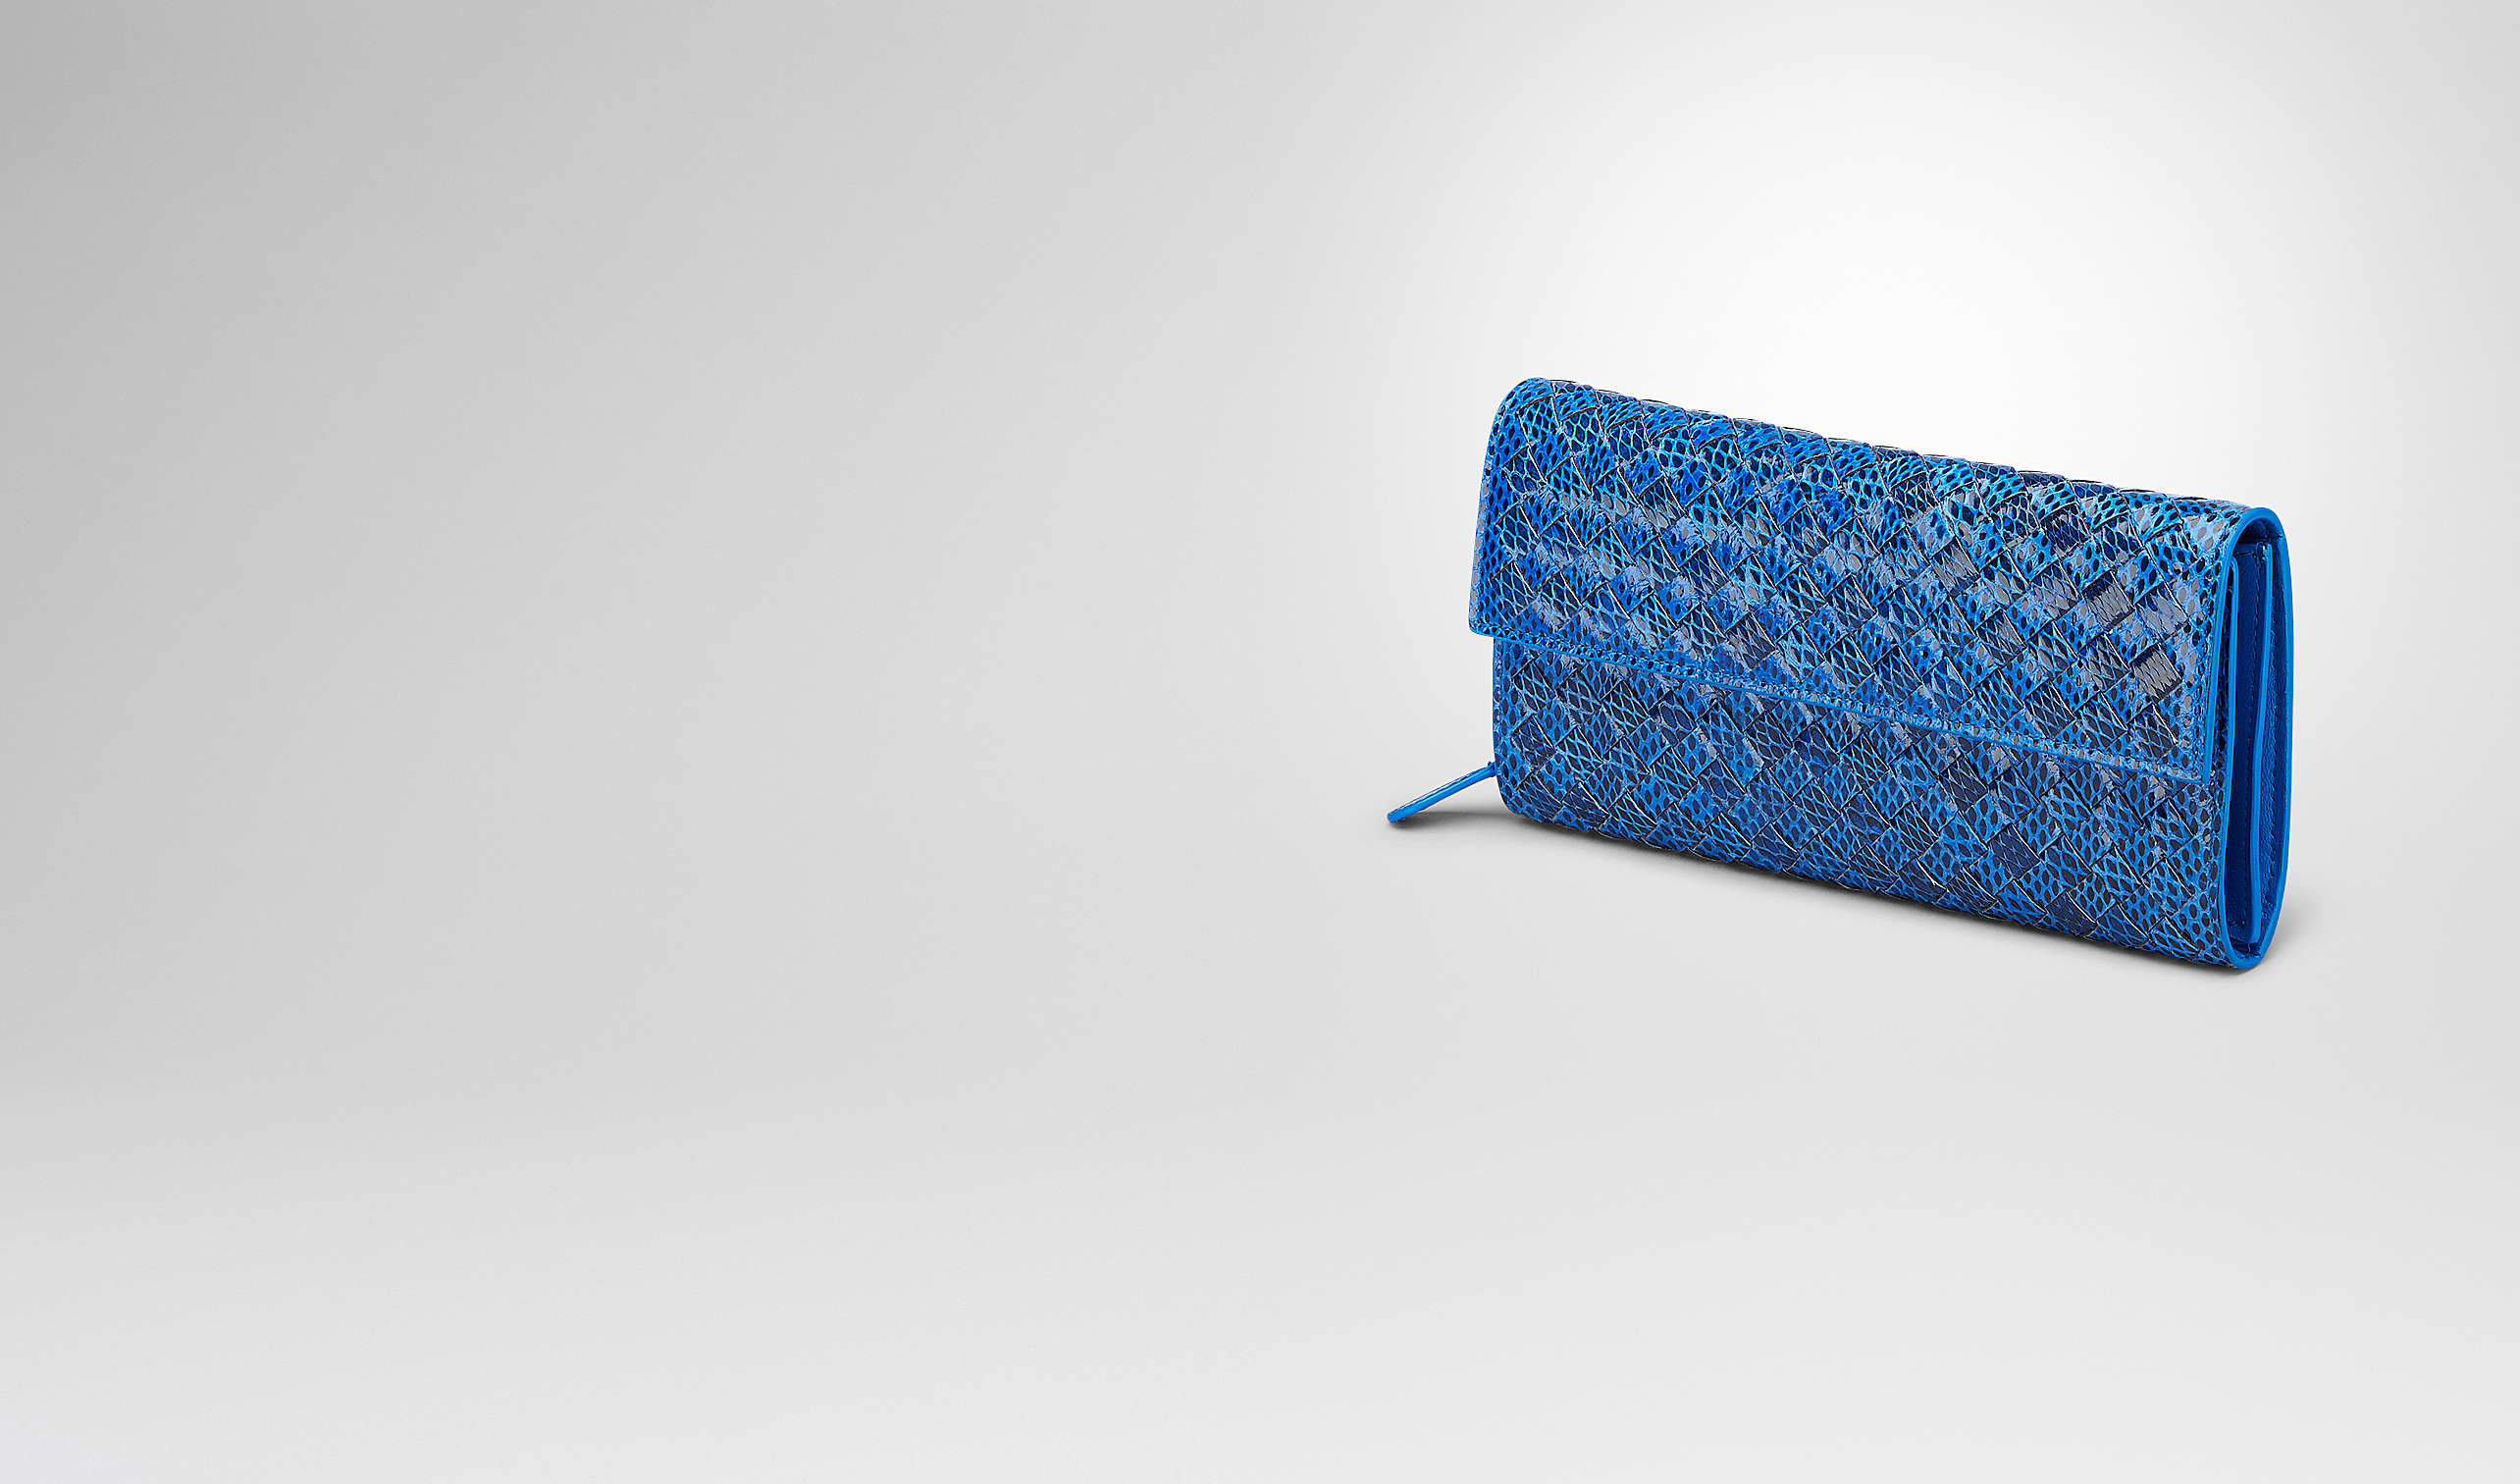 BOTTEGA VENETA Portafoglio continental D PORTAFOGLIO CONTINENTAL SIGNAL BLUE IN AYERS LIVREA INTRECCIATO pl